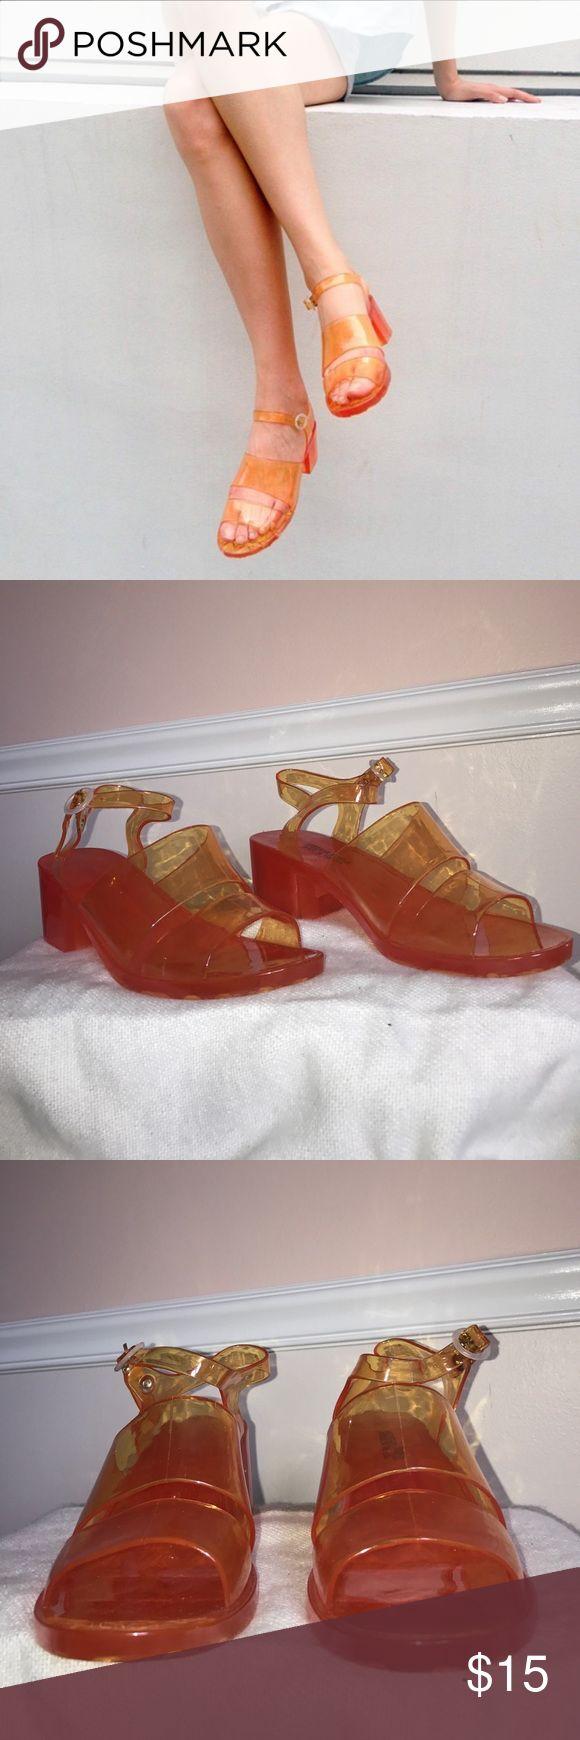 American Apparel electric orange jelly heels American Apparel electric orange jelly heels - never worn. Heel is 2 inches. American Apparel Shoes Heels